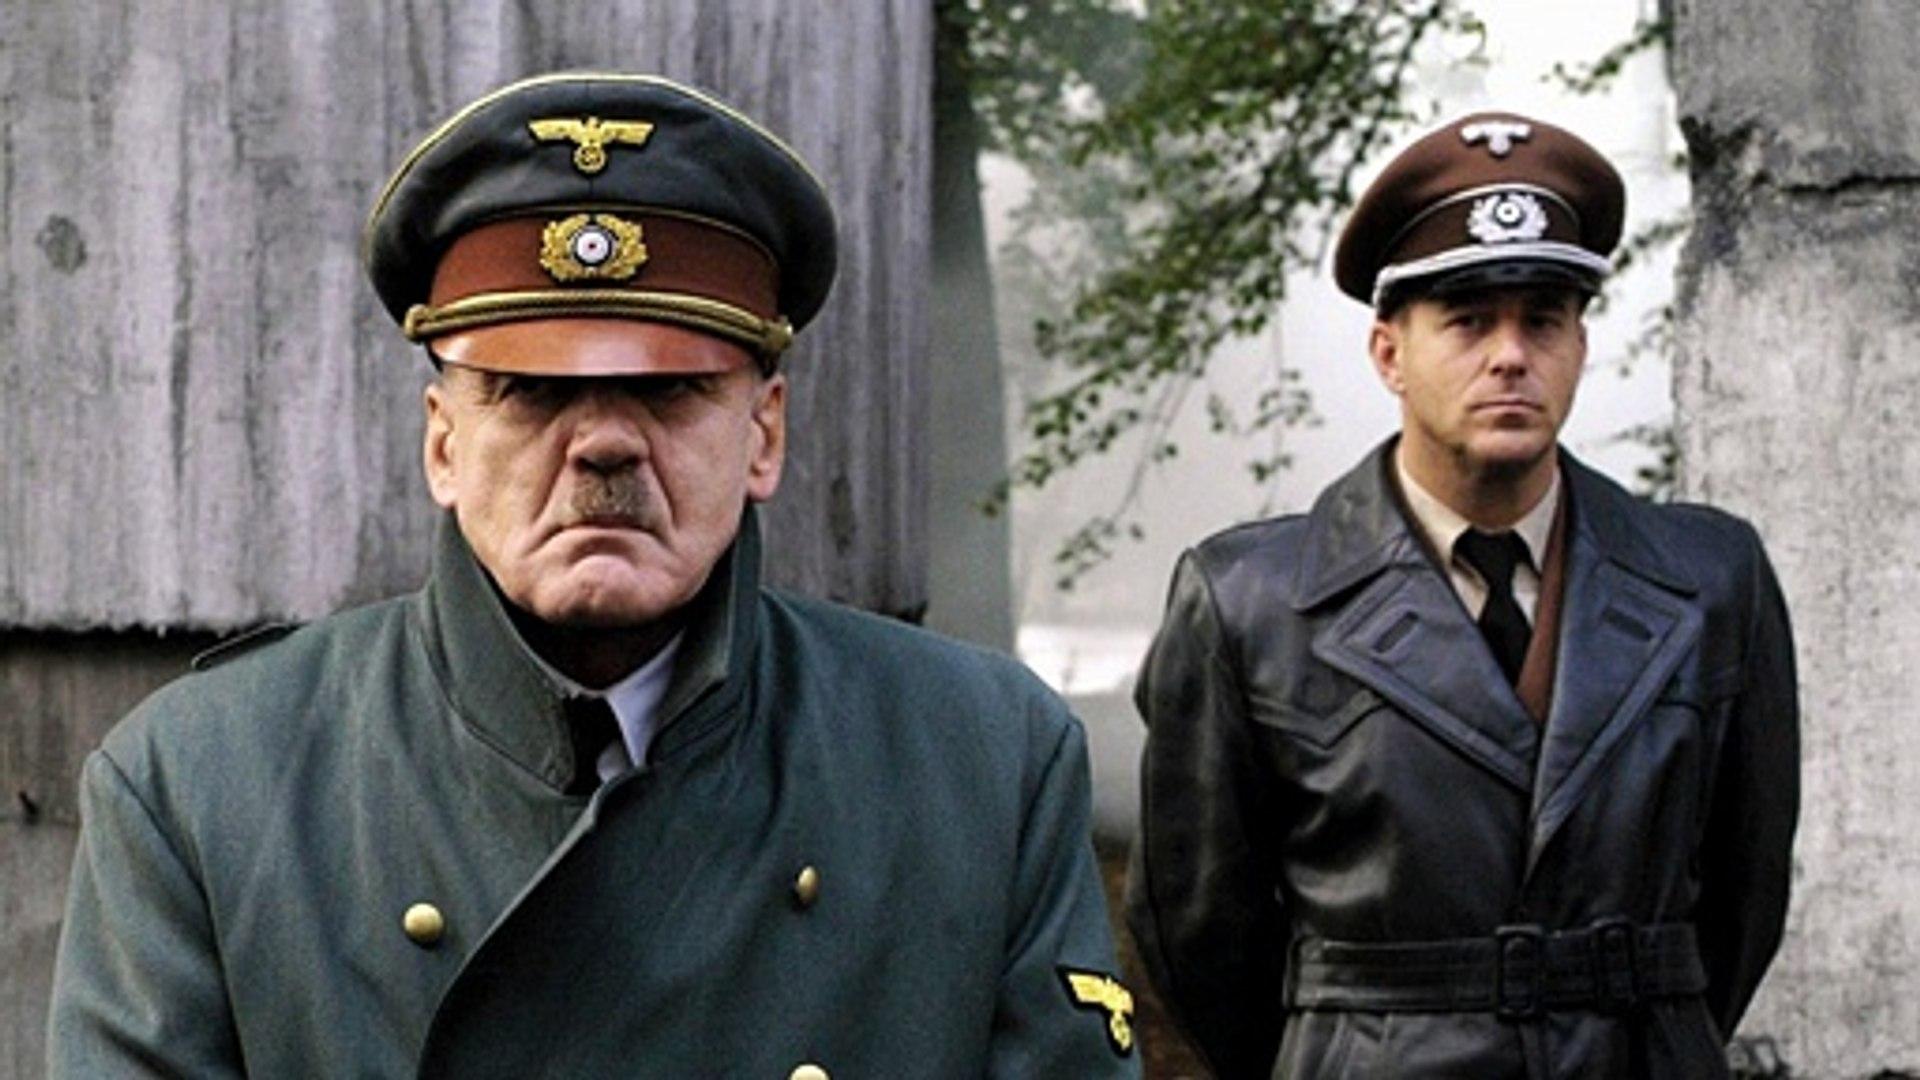 downfall full movie online free english subtitles